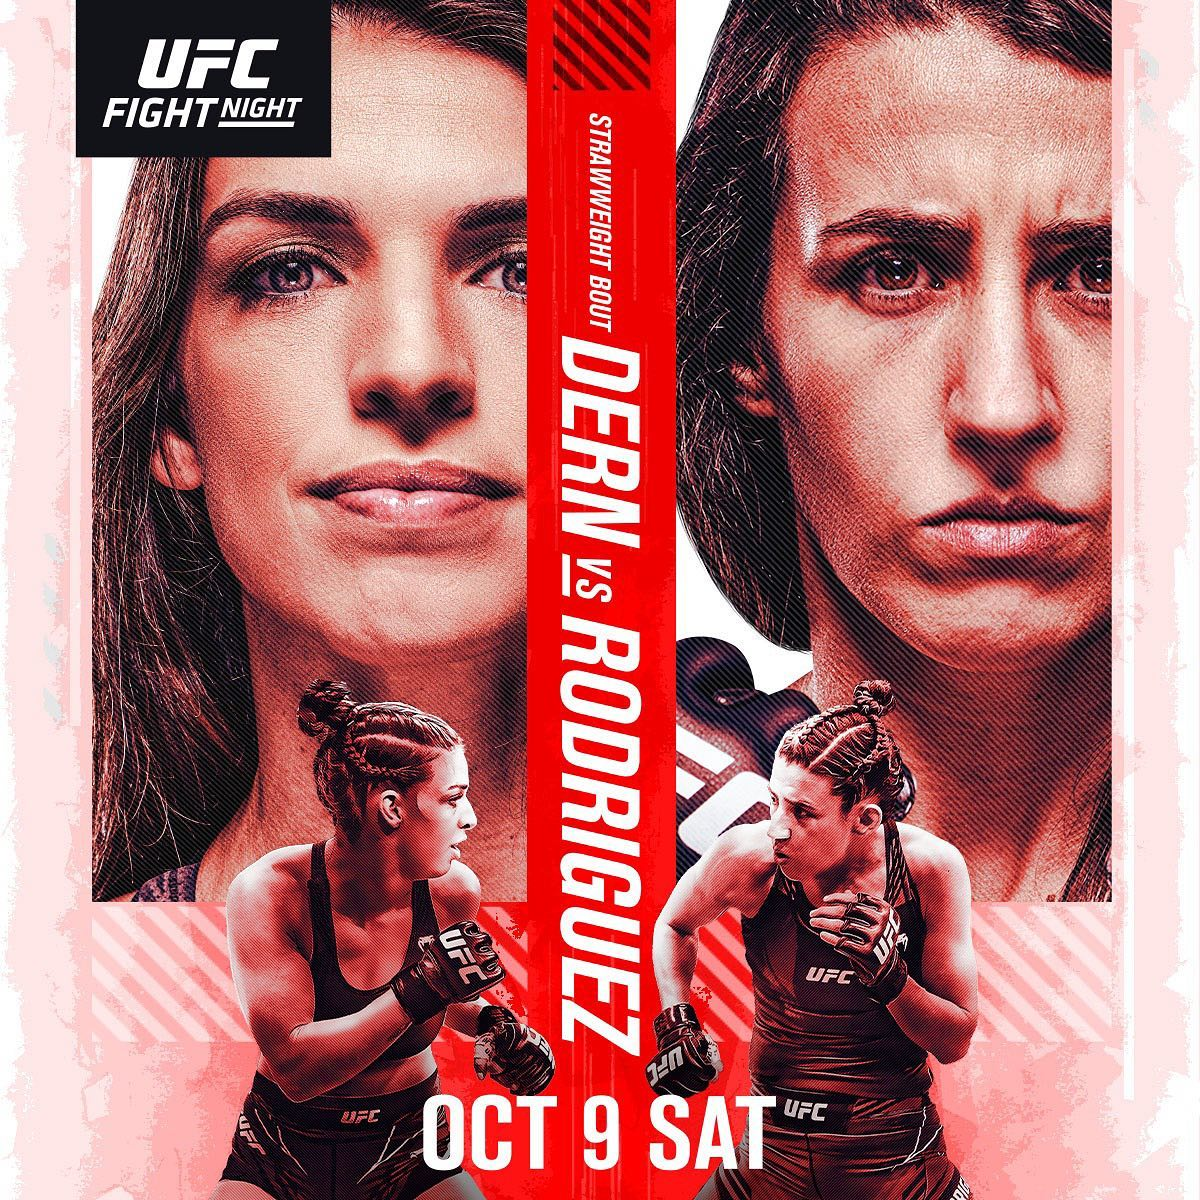 UFC Tonight: Schedule, start time, full fight card, how to watch Mackenzie Dern vs. Marina Rodriguez